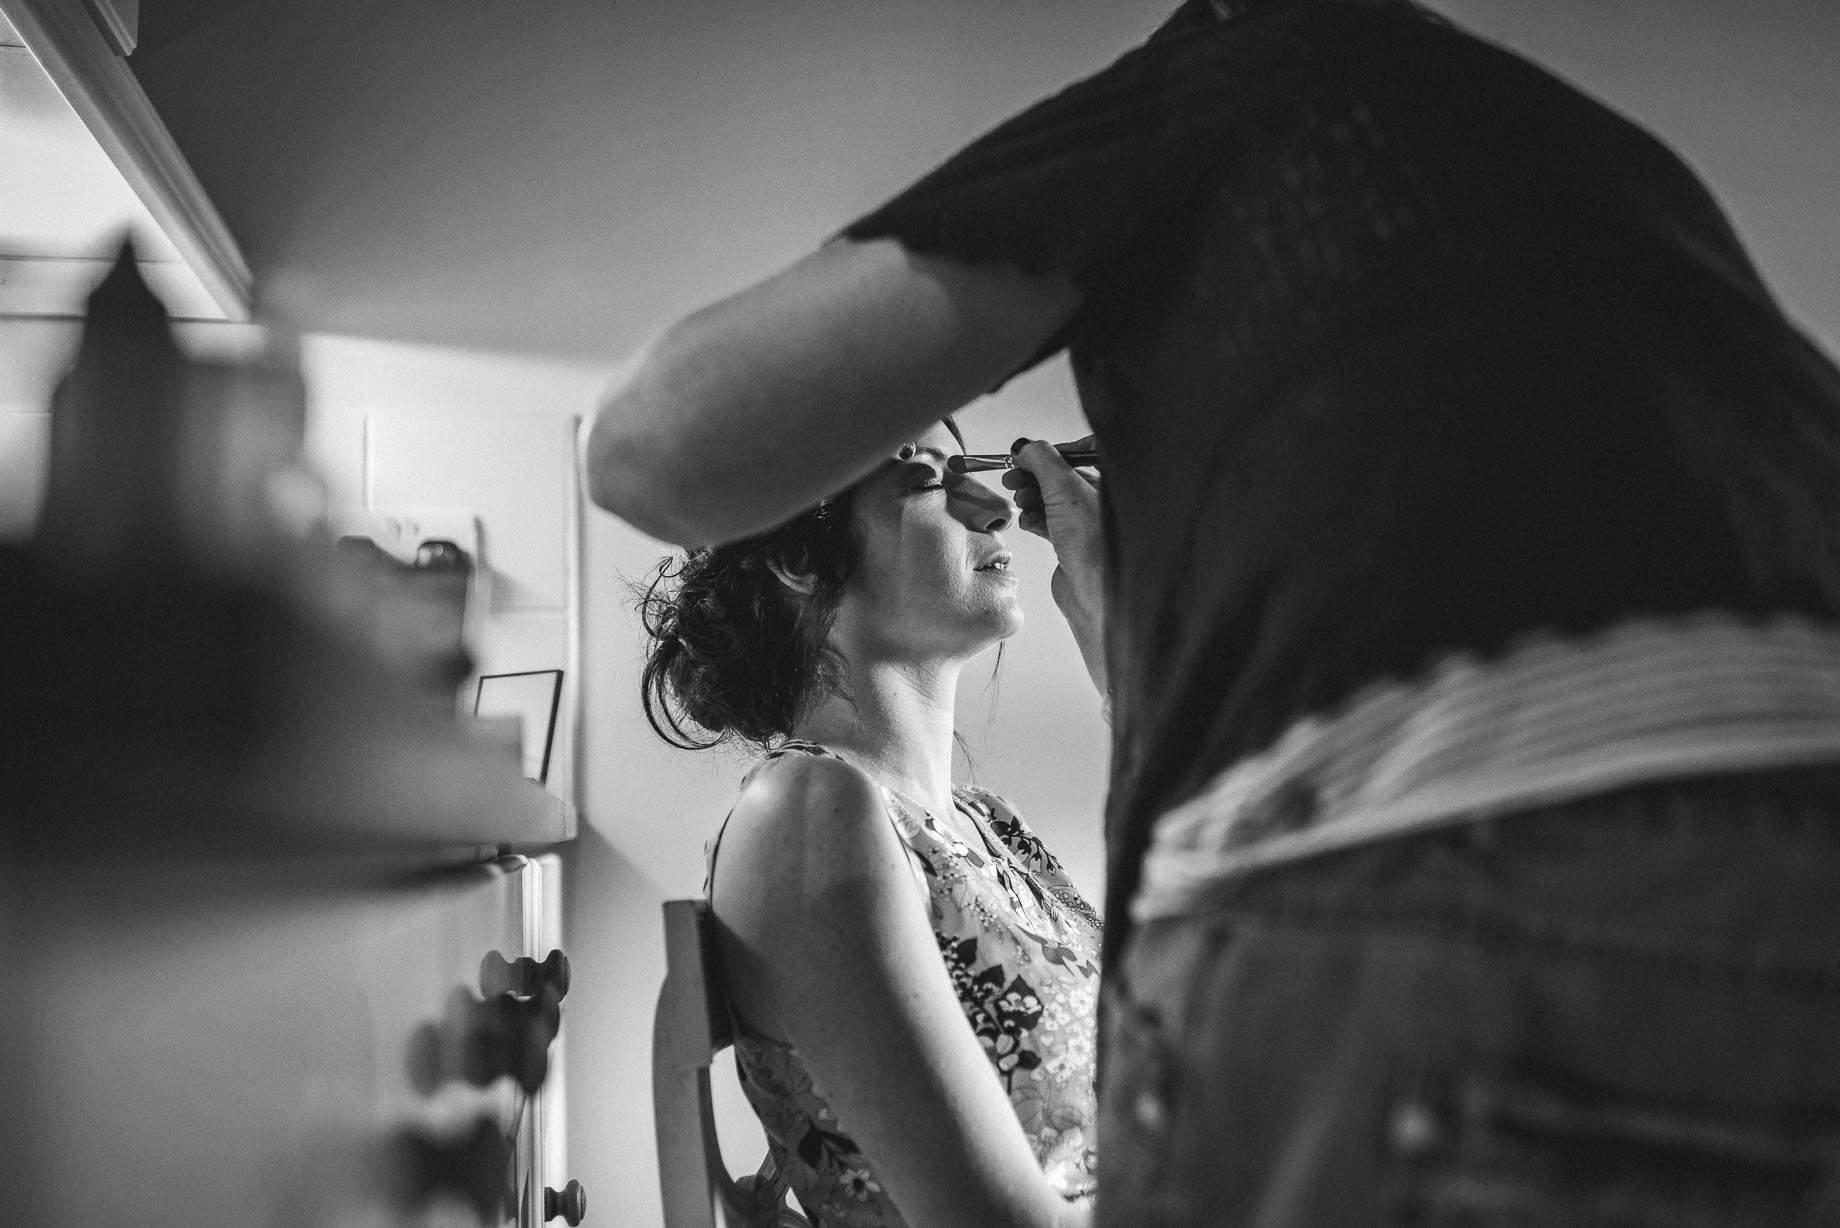 Gaynes Park wedding photography - Guy Collier Photography - Rachel and Jon (25 of 169)